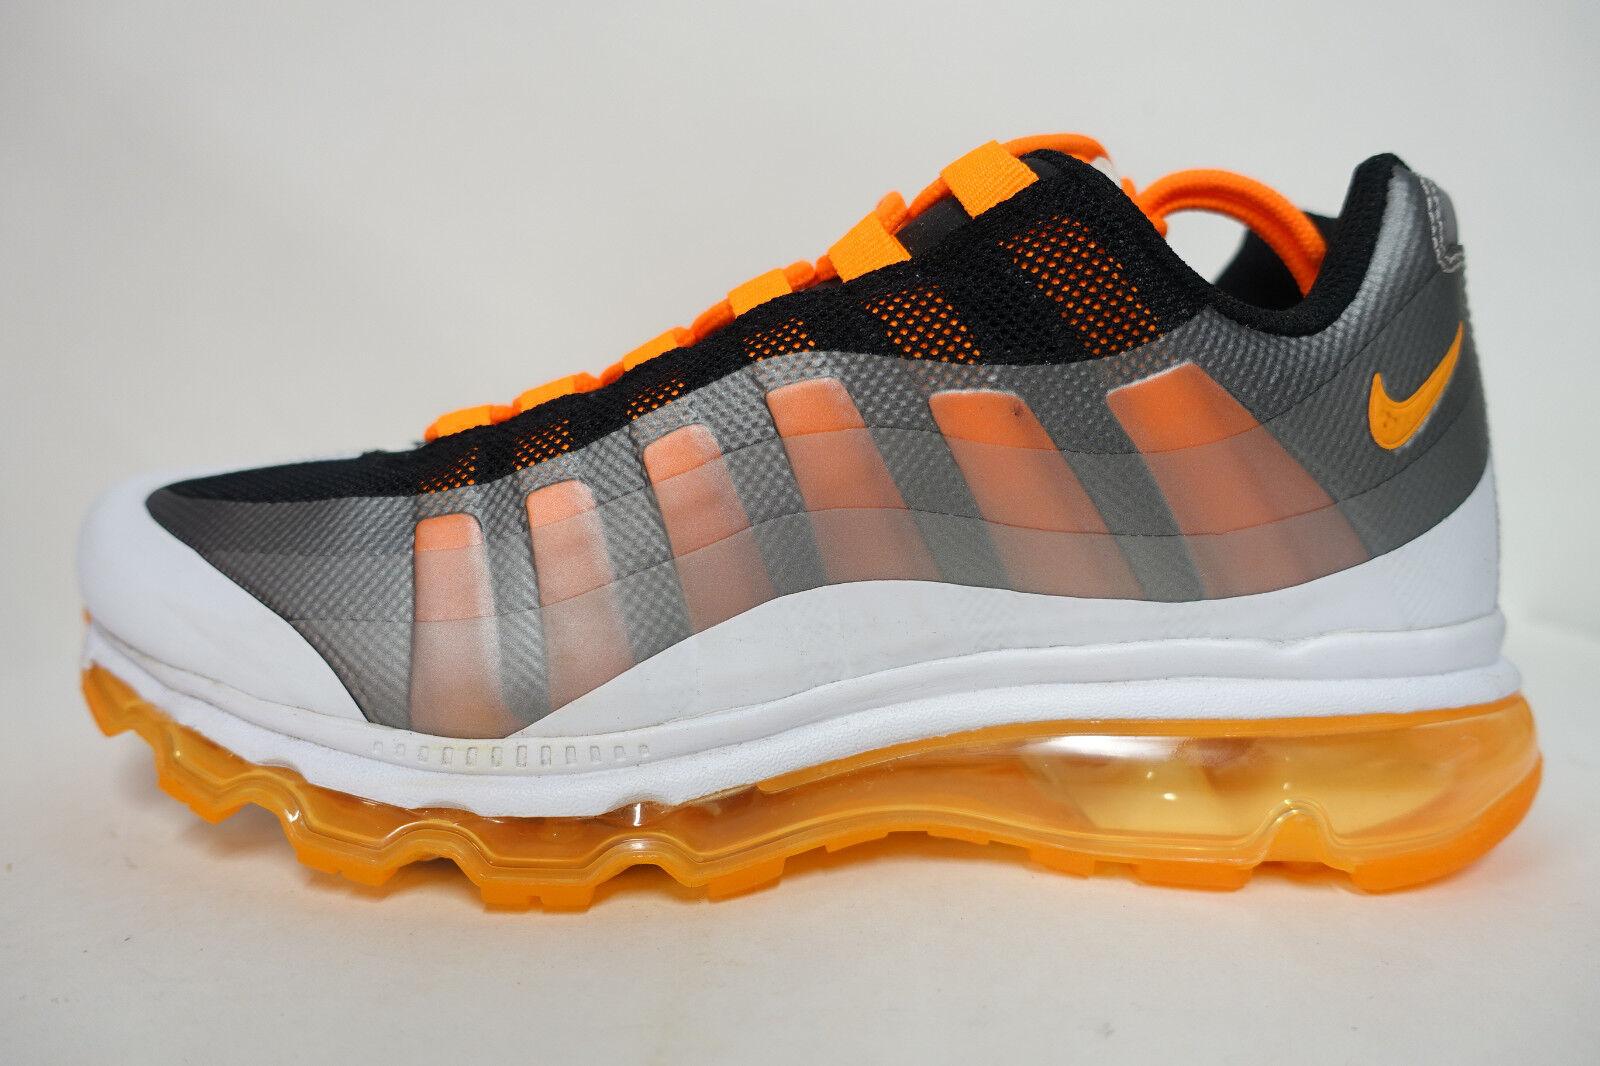 buy online abbe3 1f1d9 ... MEN S NIKE AIR MAX SIZE 95+ BB SHOES SIZE MAX 8 white black orange ...